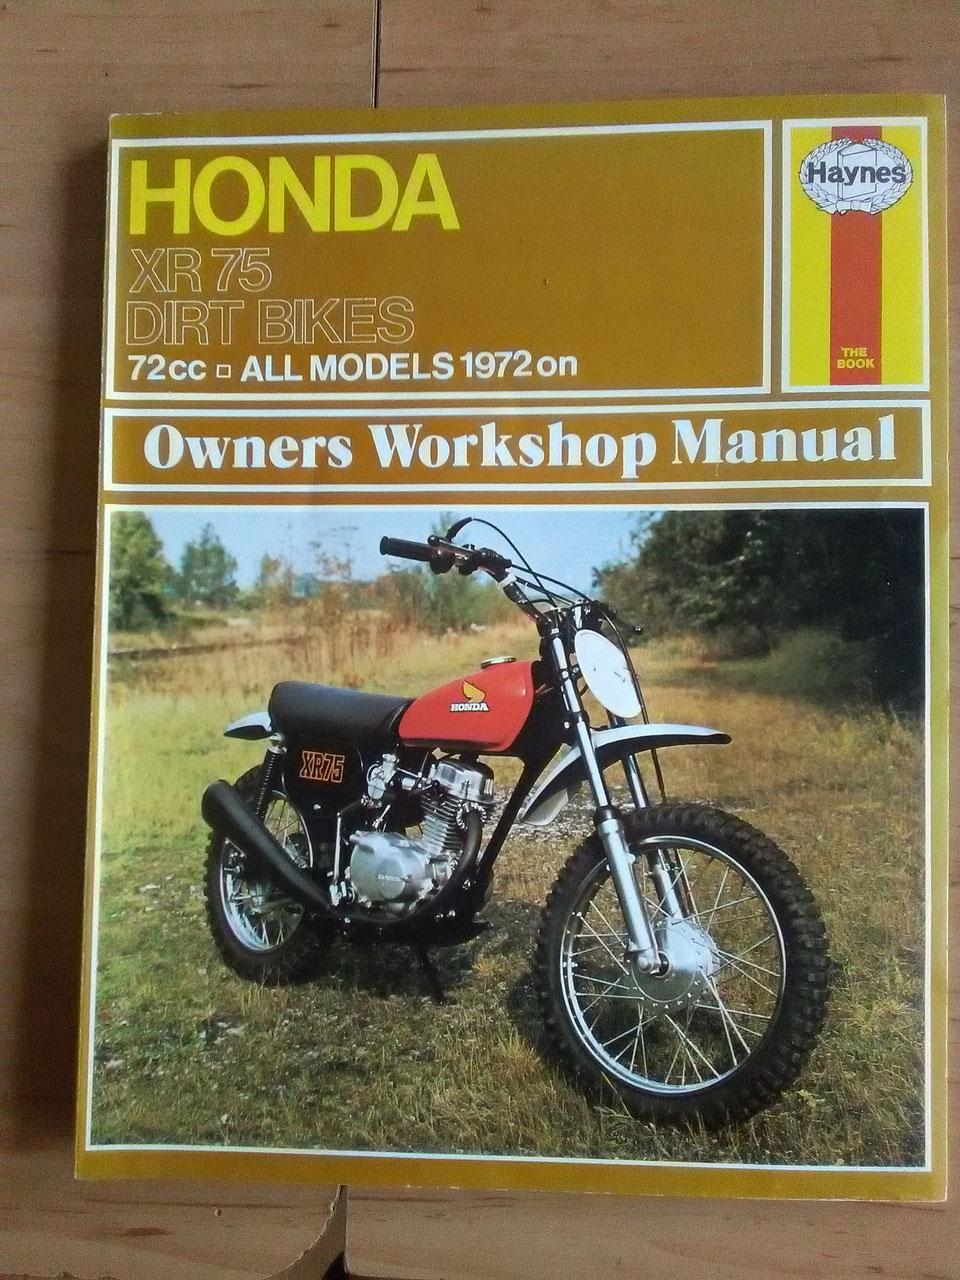 Erfreut 2003 Honda Schatten Schaltplan Fotos - Schaltplan Serie ...